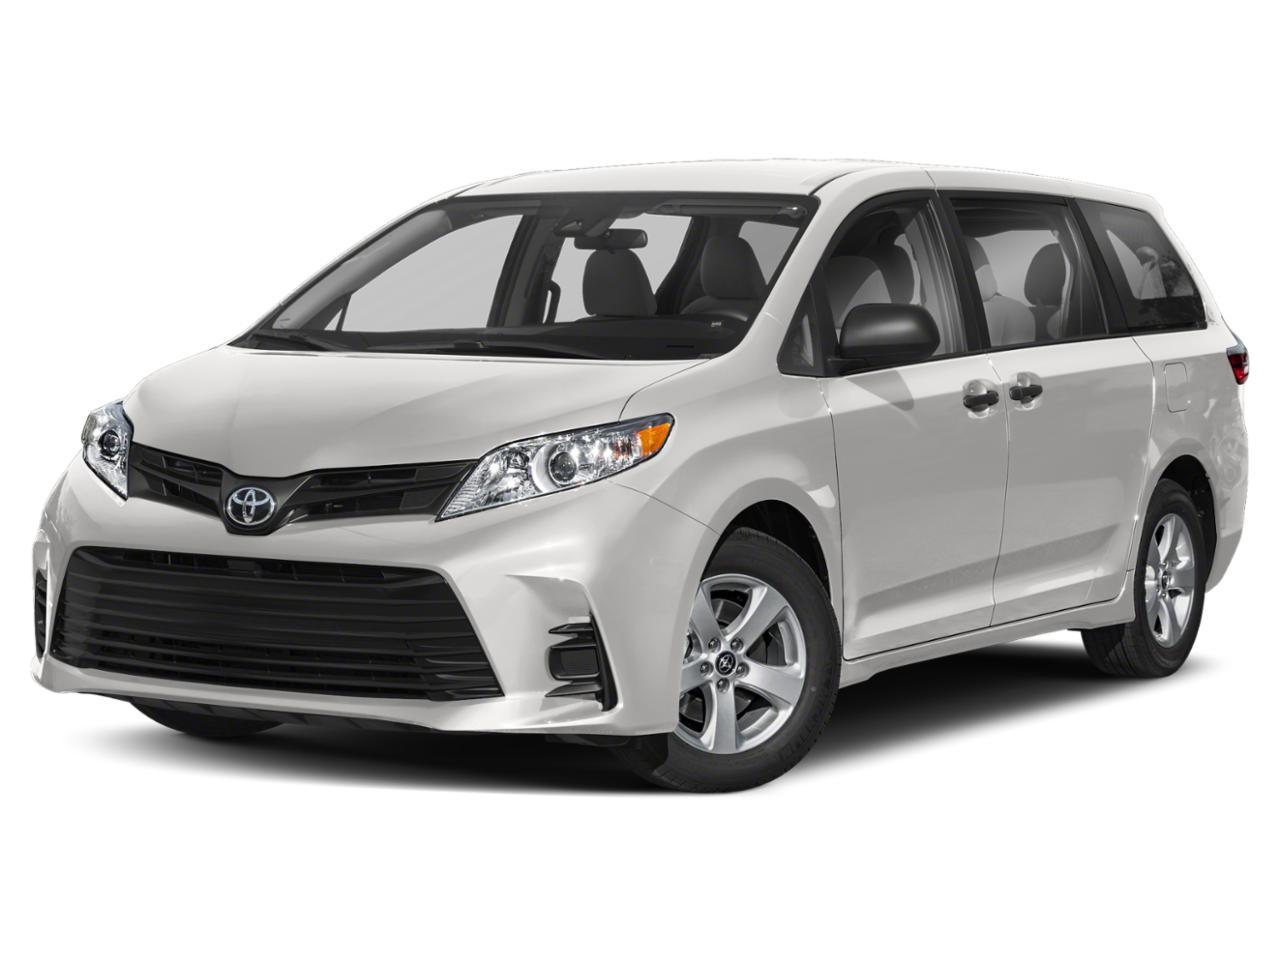 2018 Toyota Sienna Vehicle Photo in Plainfield, IL 60586